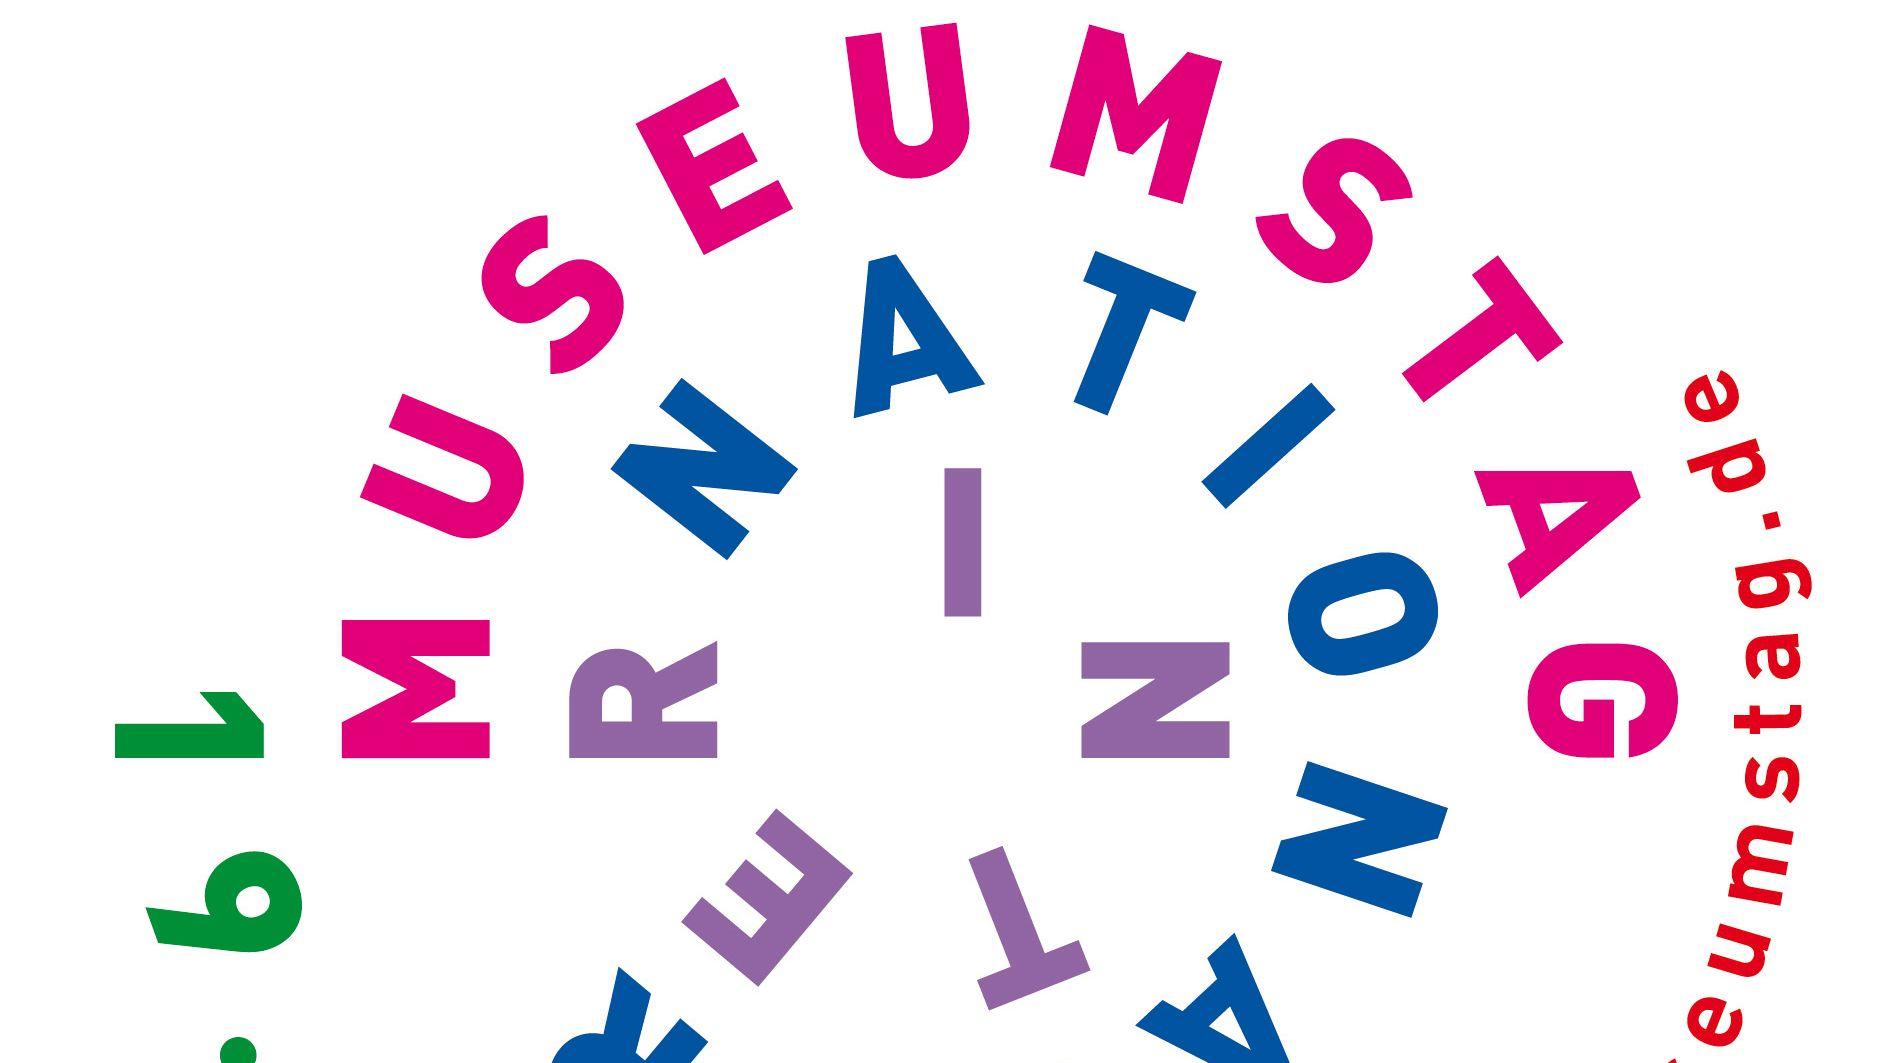 Logo des Internationalen Museumstags